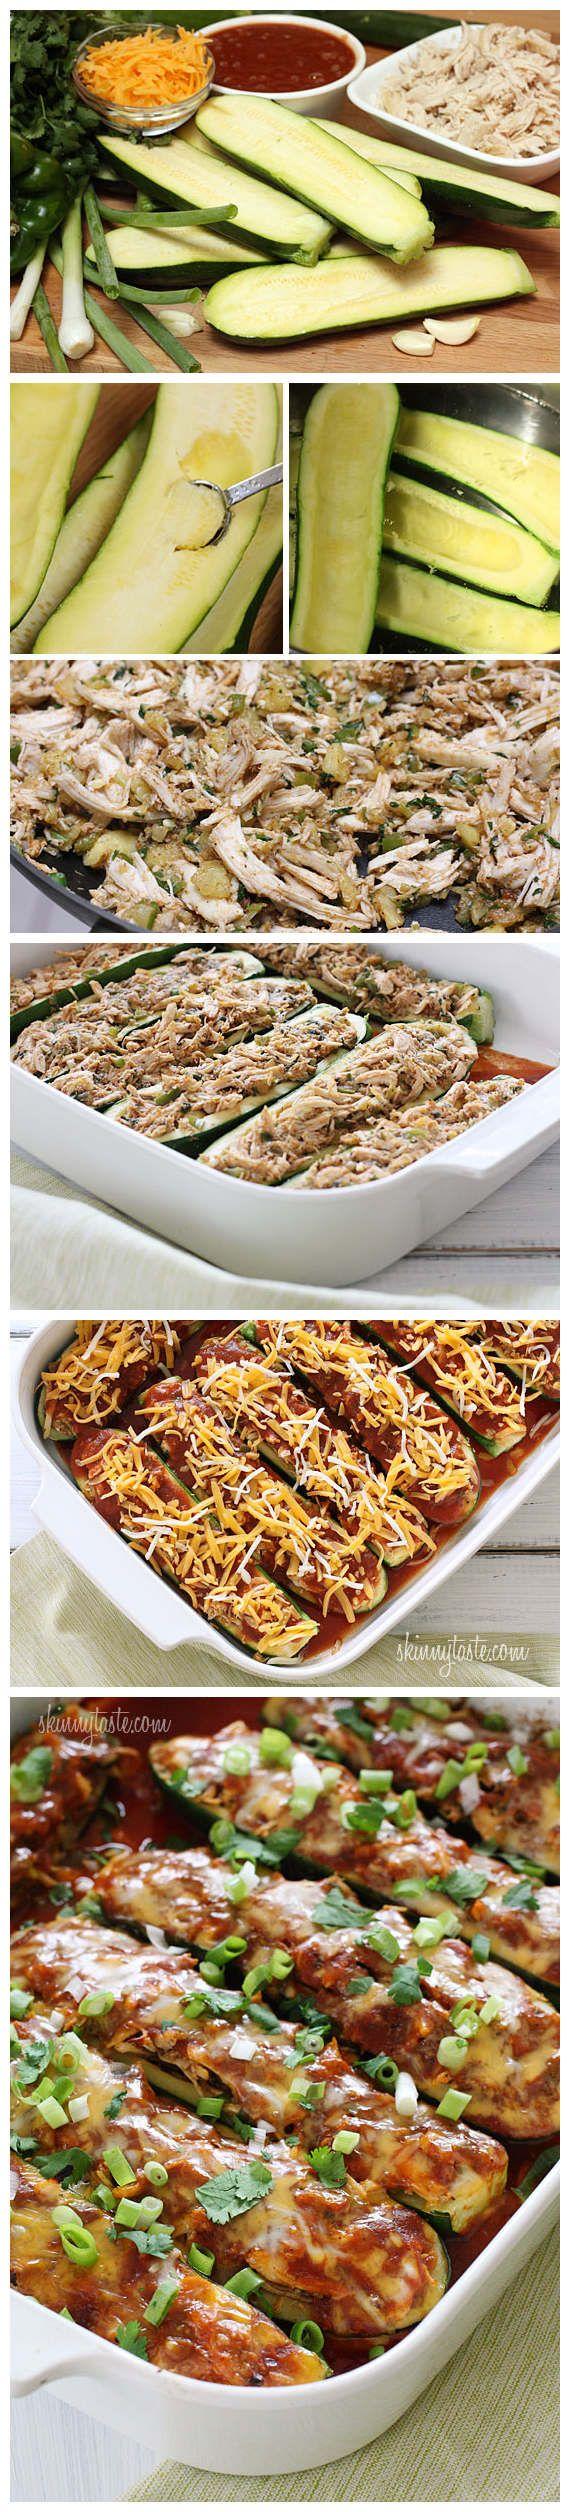 Chicken Enchilada Stuffed Zucchini Boats | Yum Yum | Pinterest